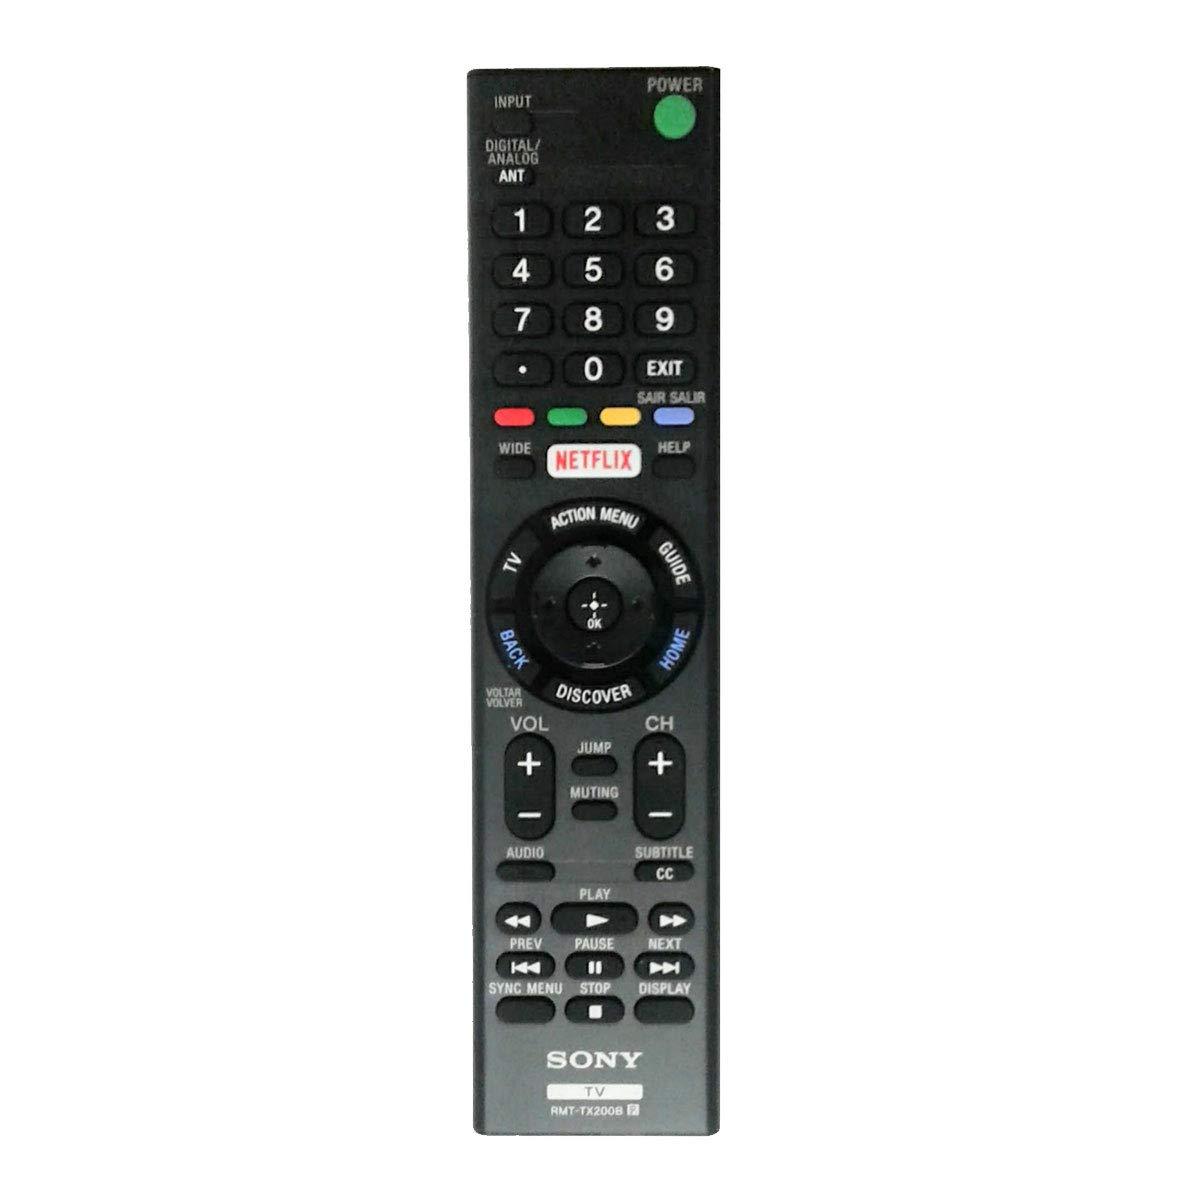 Control Remoto original sony XBR49X705D XBR49X707D